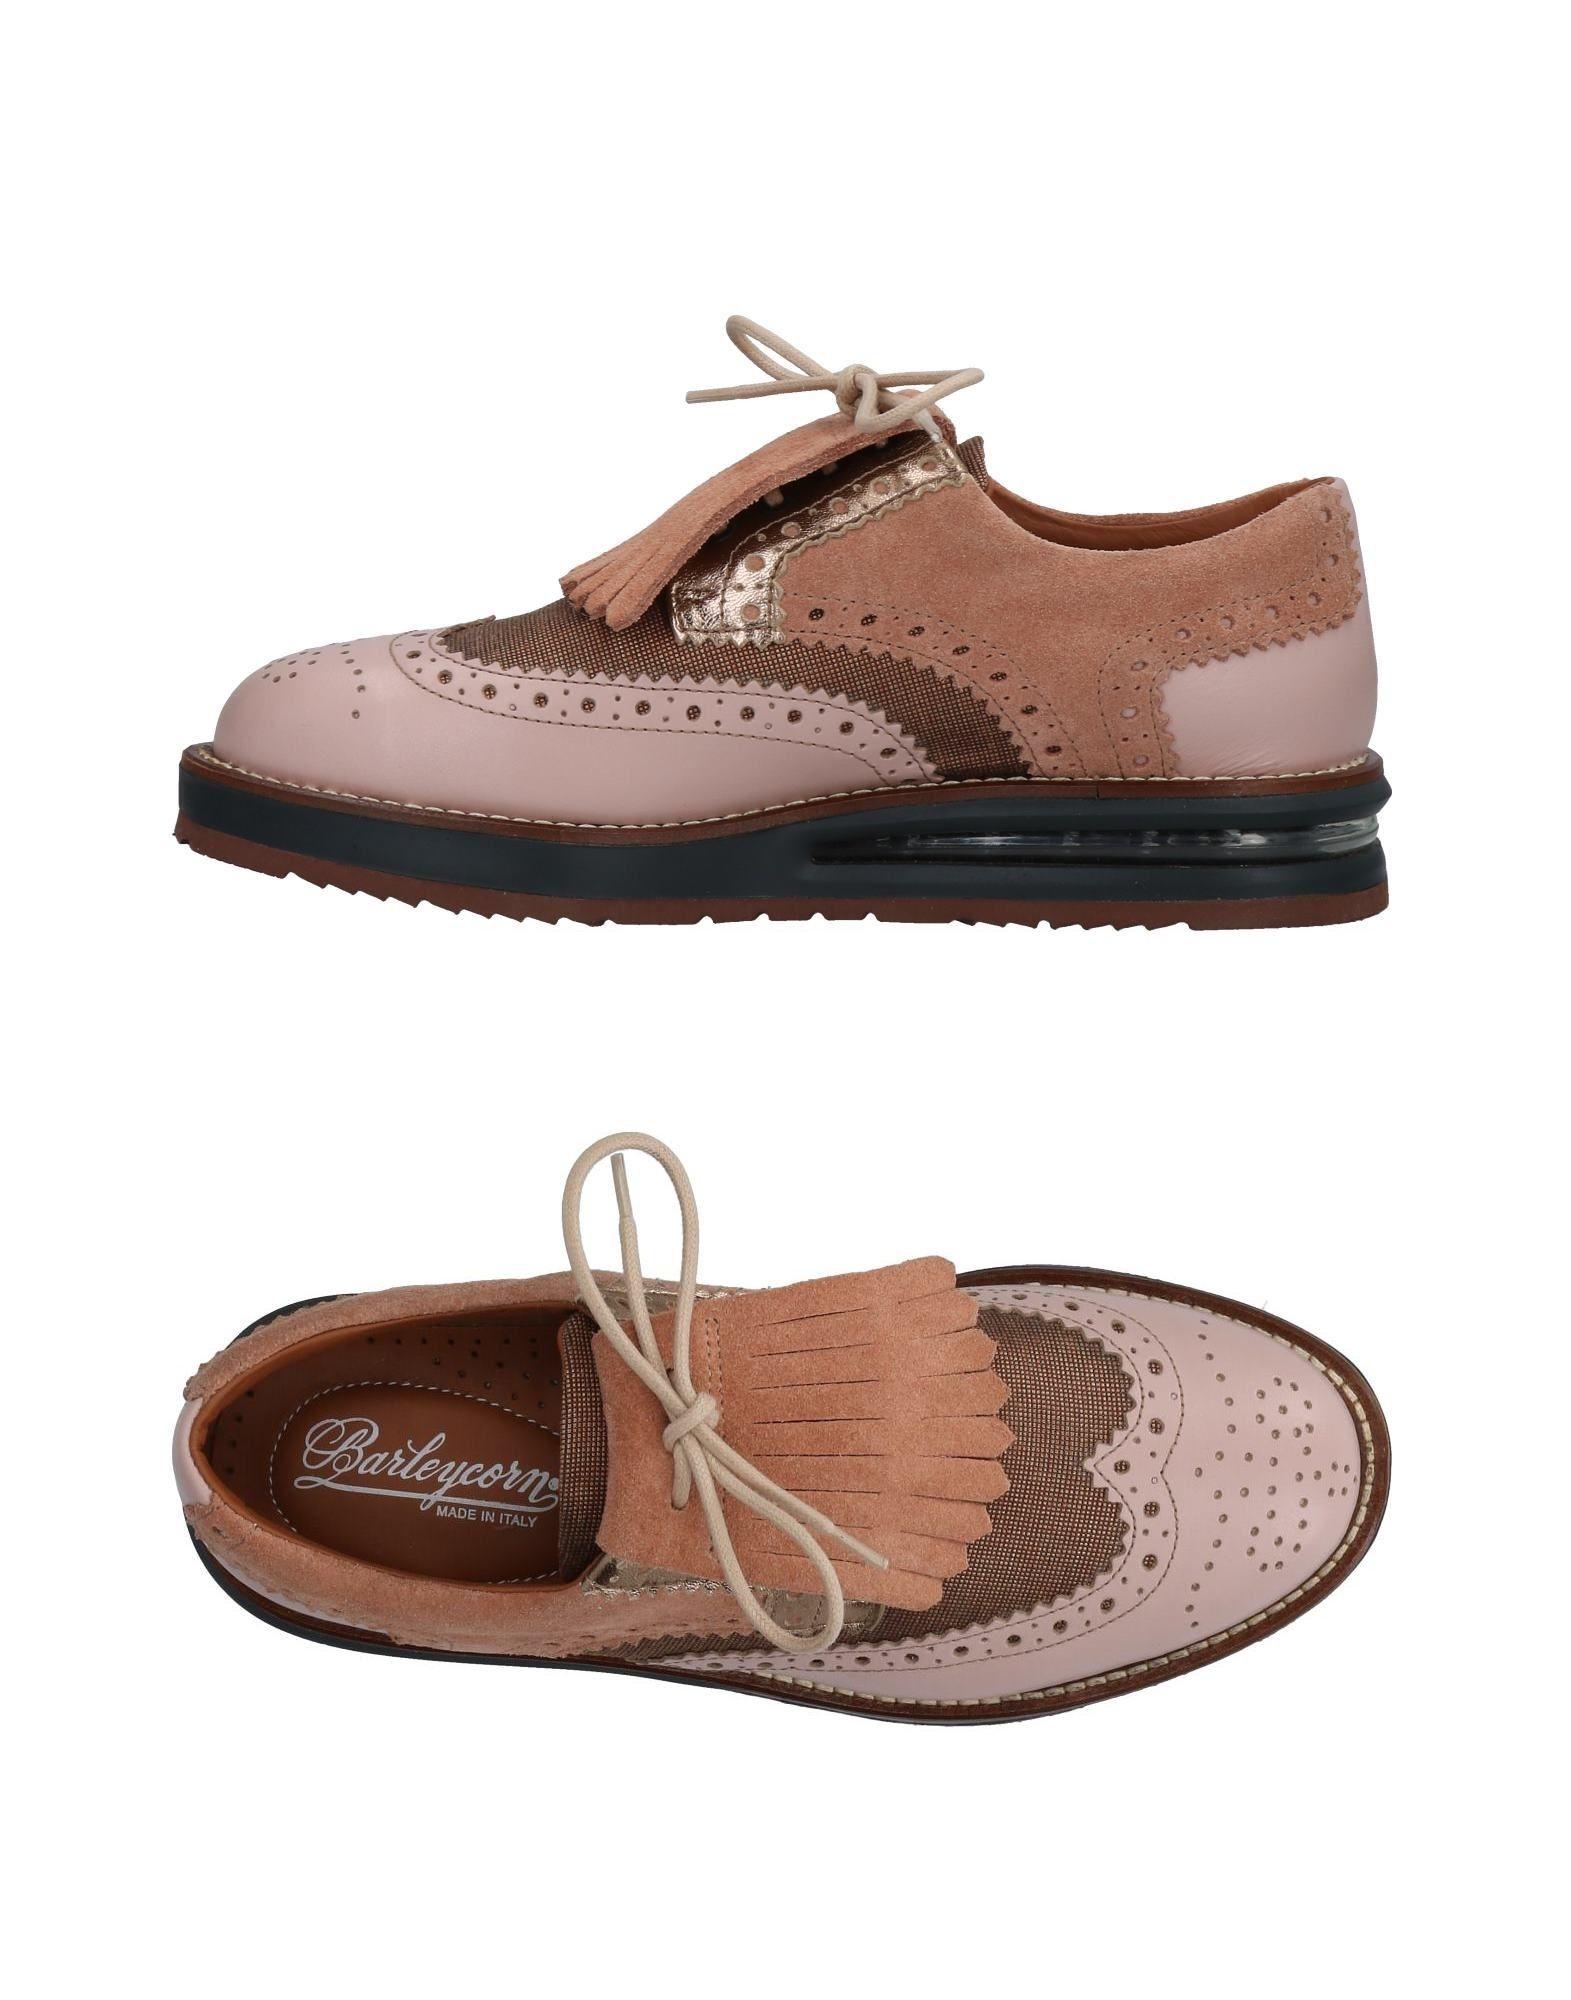 Barleycorn Schnürschuhe Damen  11478158HD Gute Qualität beliebte Schuhe